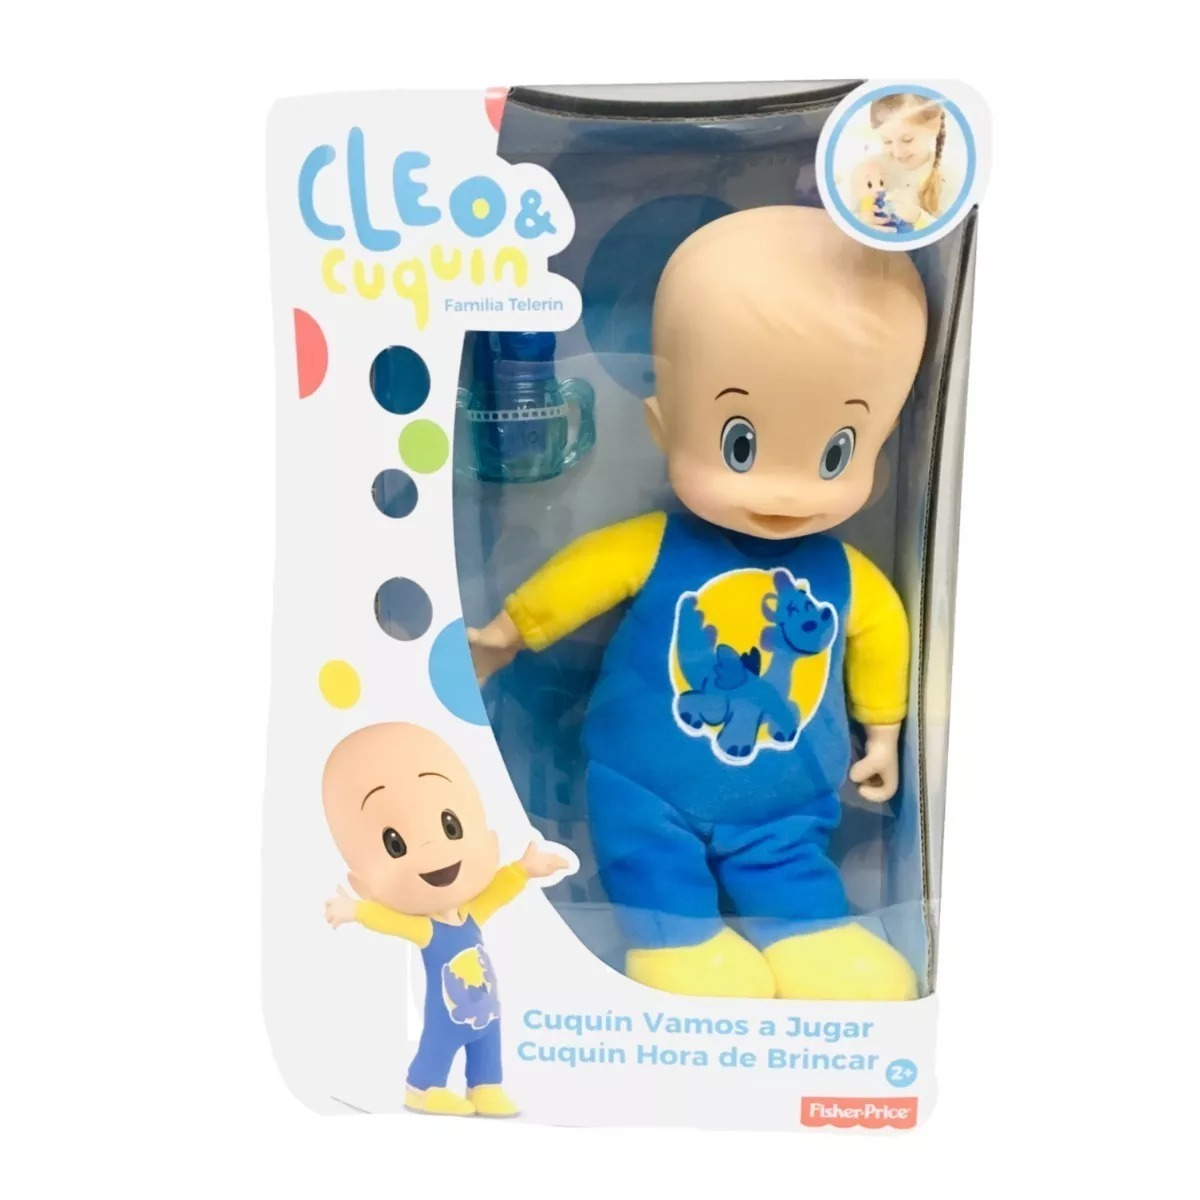 9aec7b2e2 Familia Telerín Cuquín De Cleo Fisher-price Figura - $ 449.00 en ...